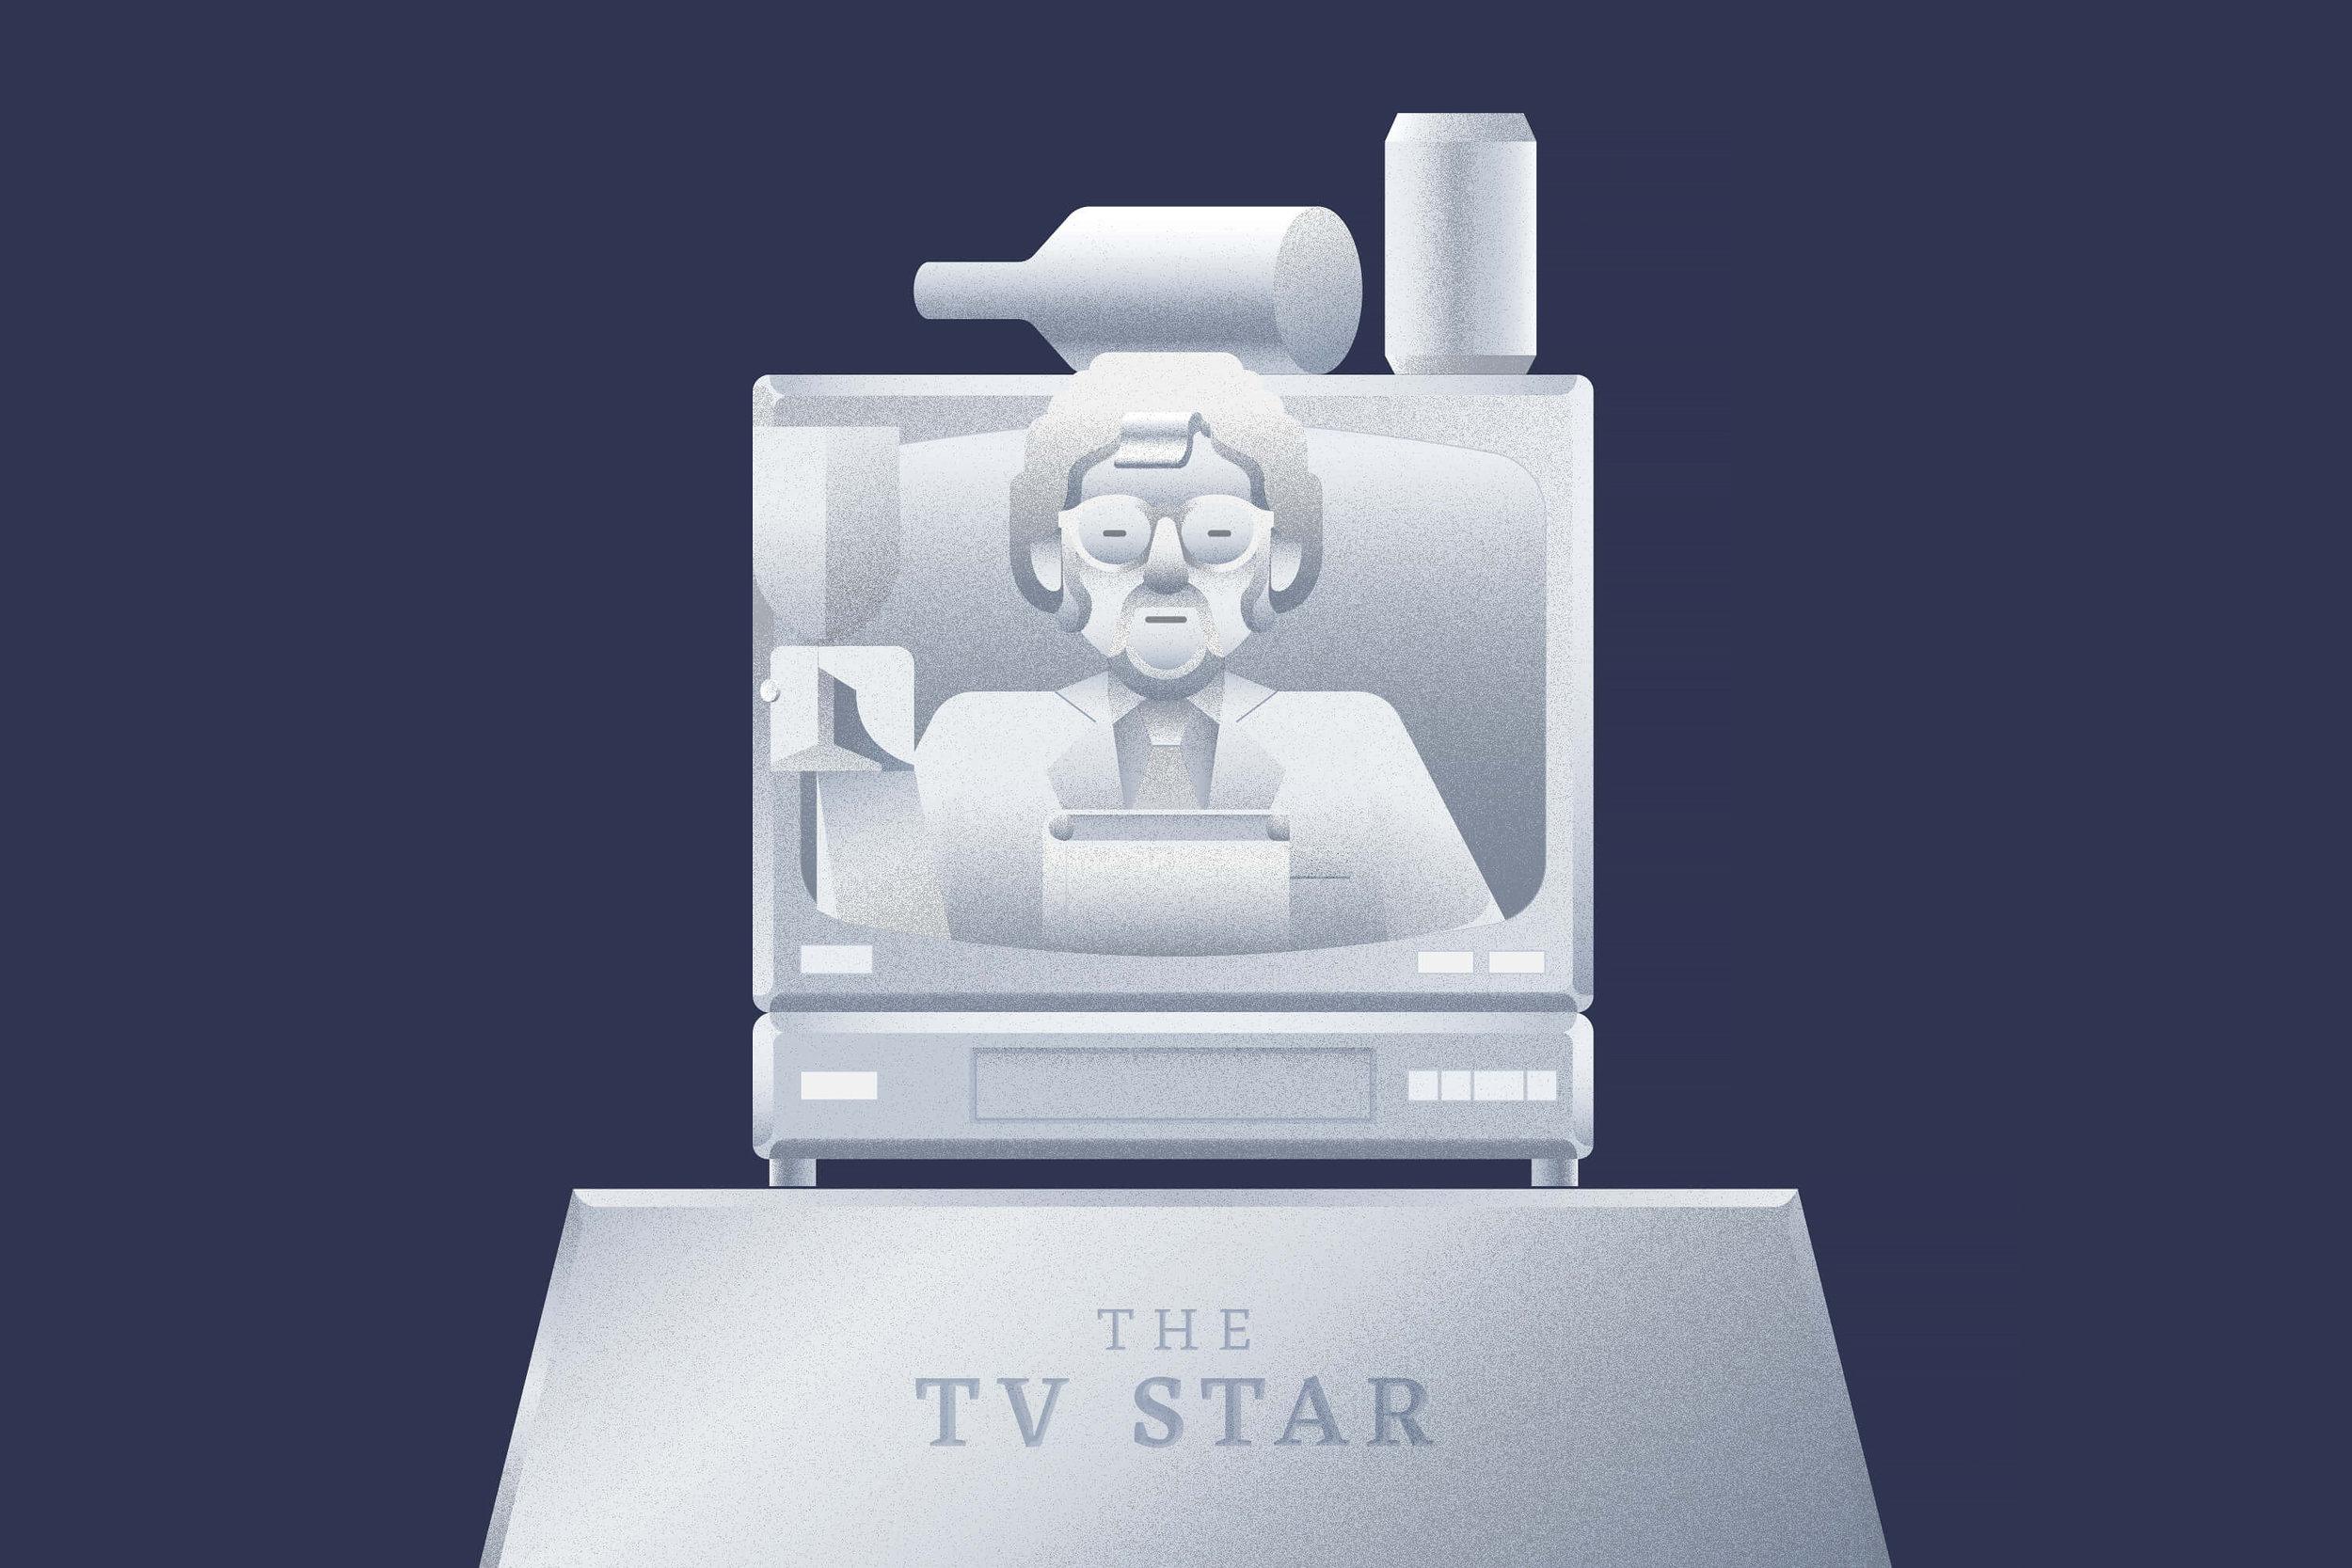 remo-remo-design-michael-jackson-tv-star.jpg